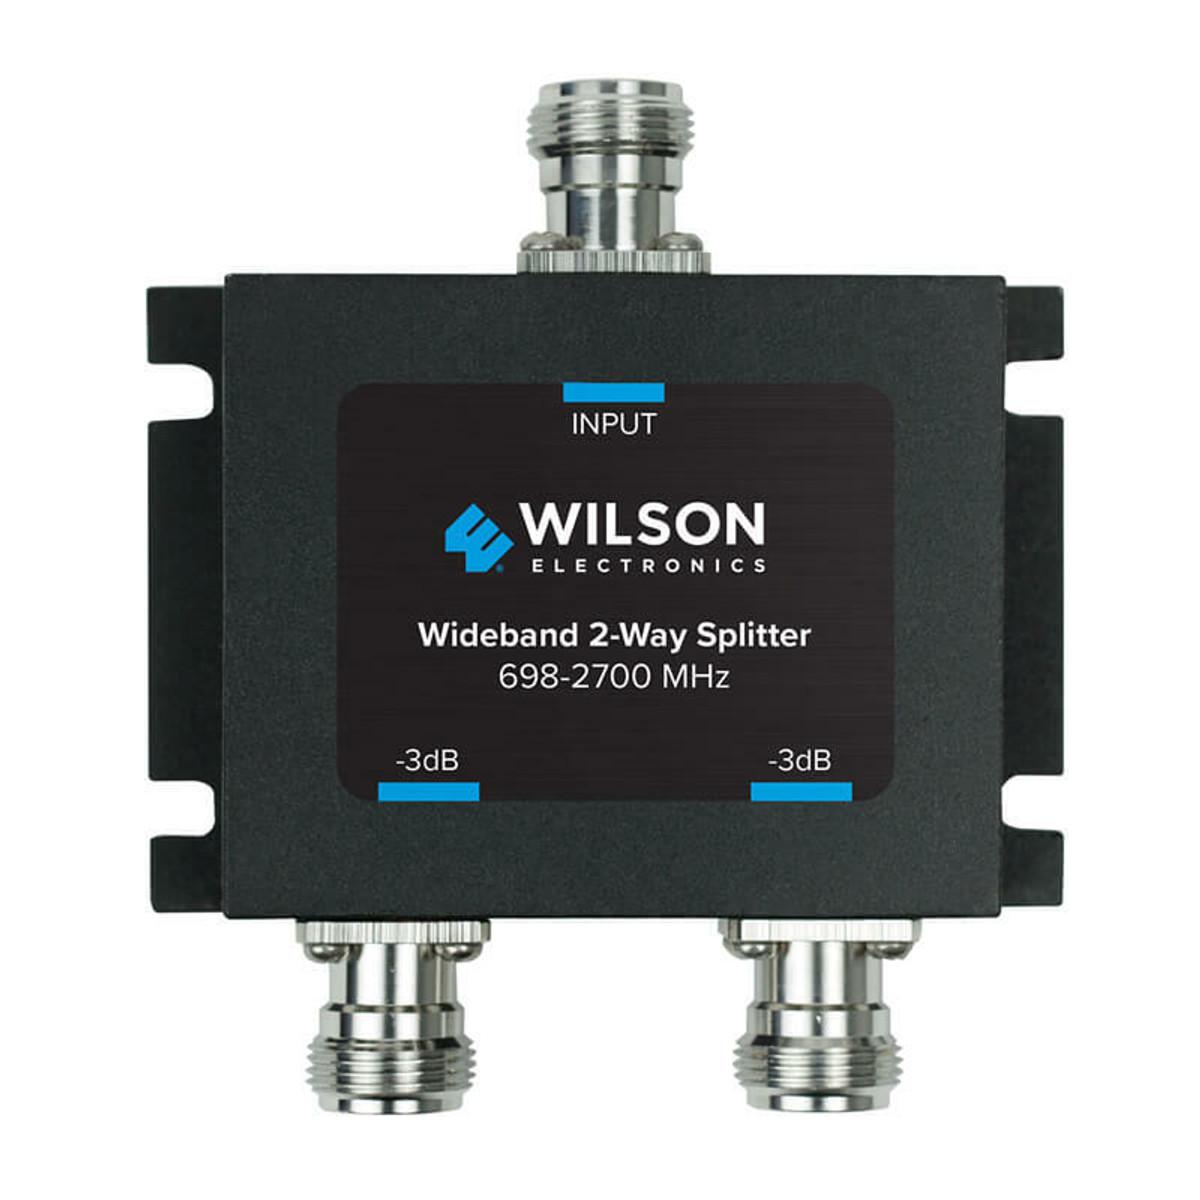 Wilson Electronics -3db 2-way Splitter for 698-2700 Mhz 50ohm | 859957